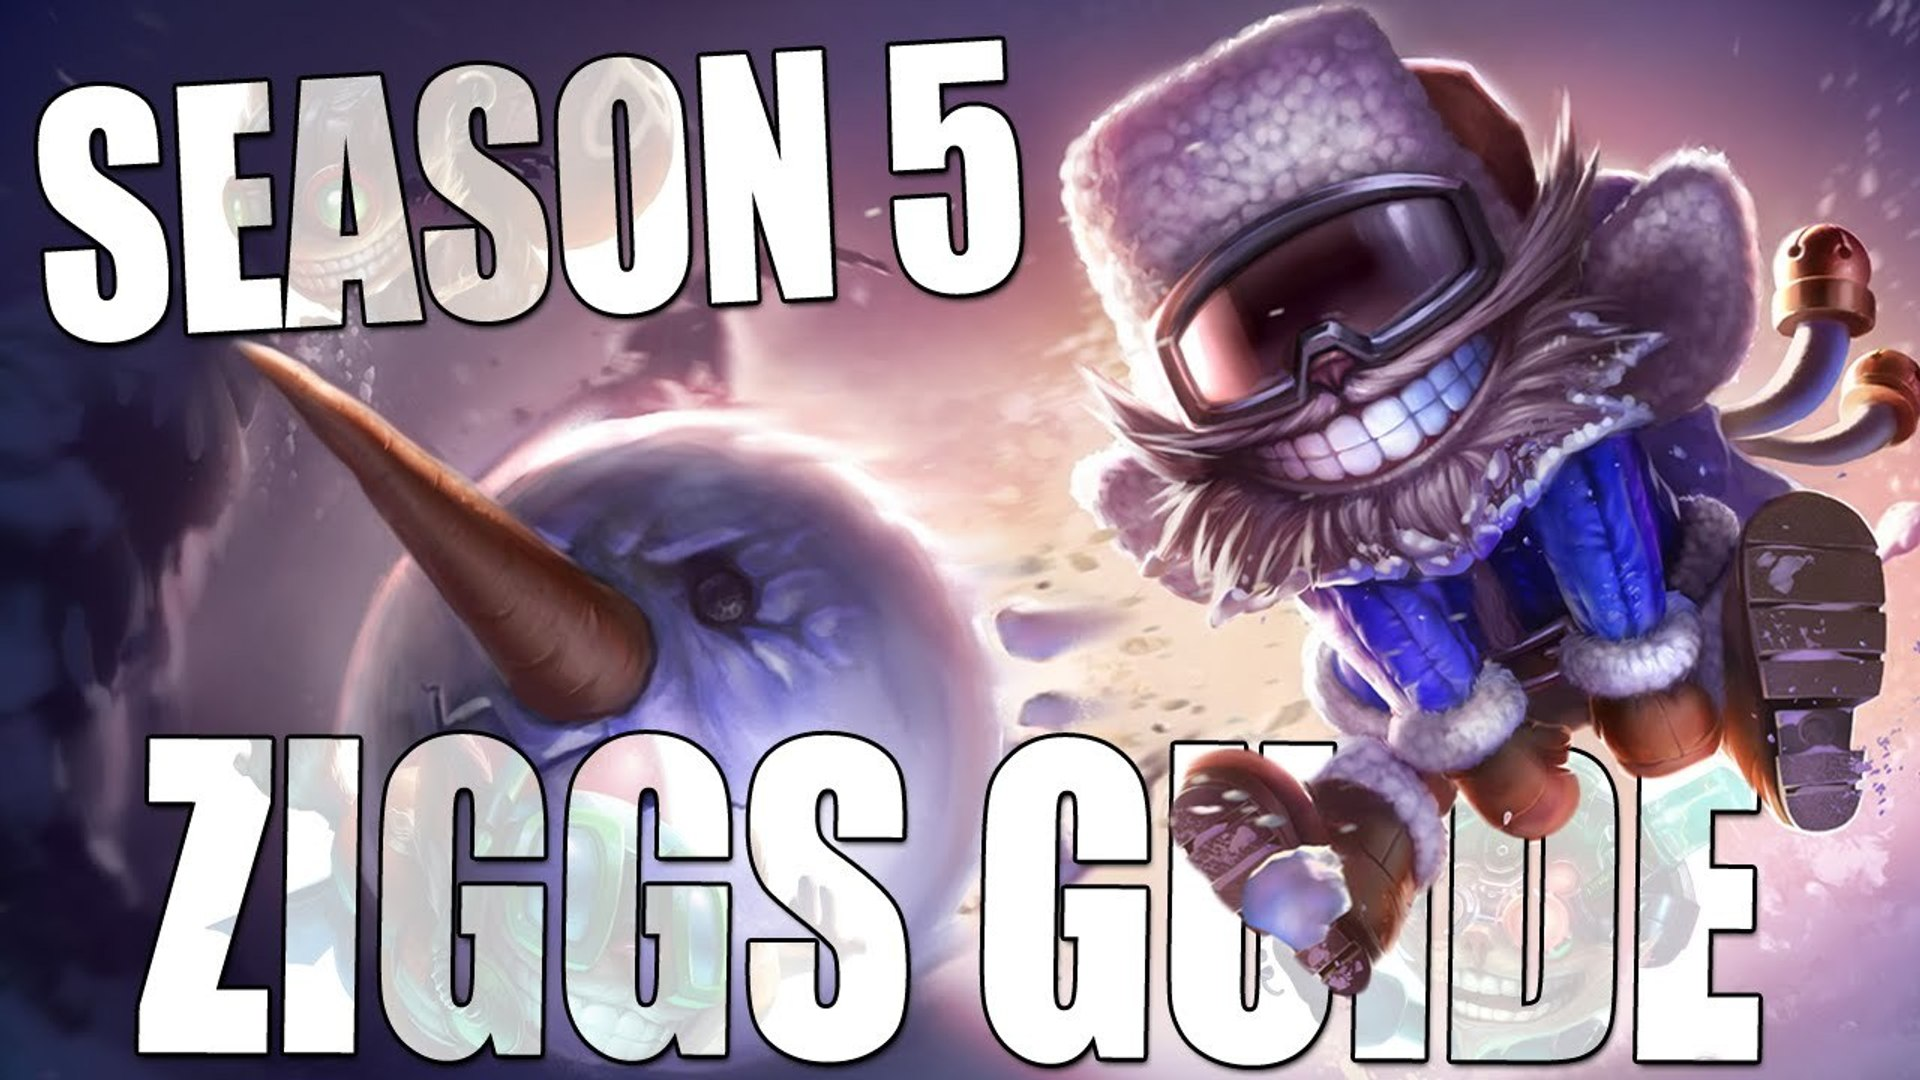 Season 5 Ziggs Guide :: League of Legends Tutorial & Gameplay!